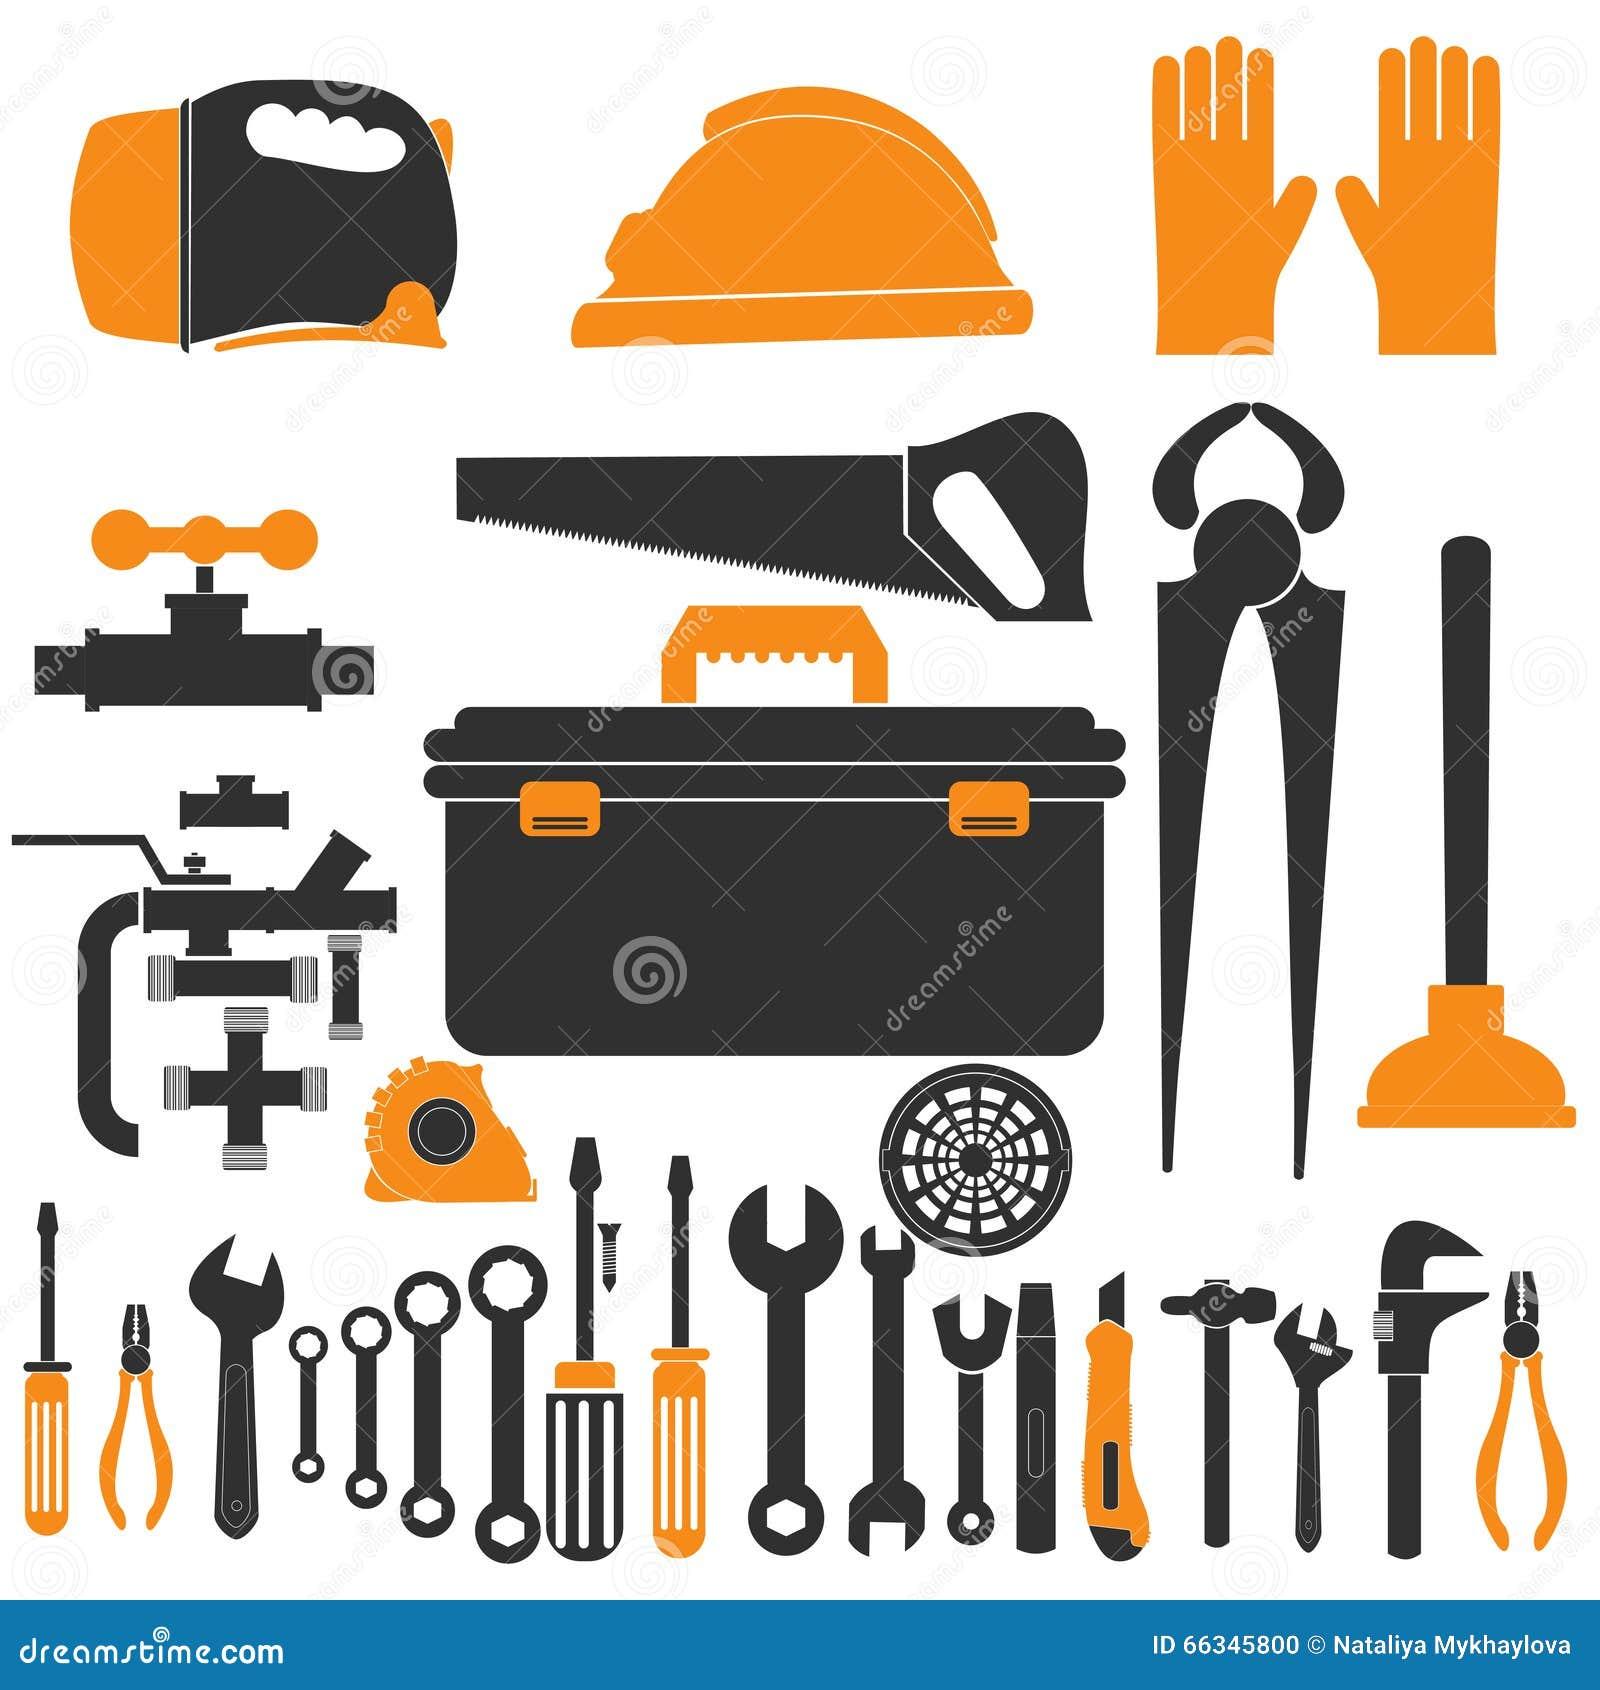 Plumbing Equipment Set Repair Tools Vector Illustration